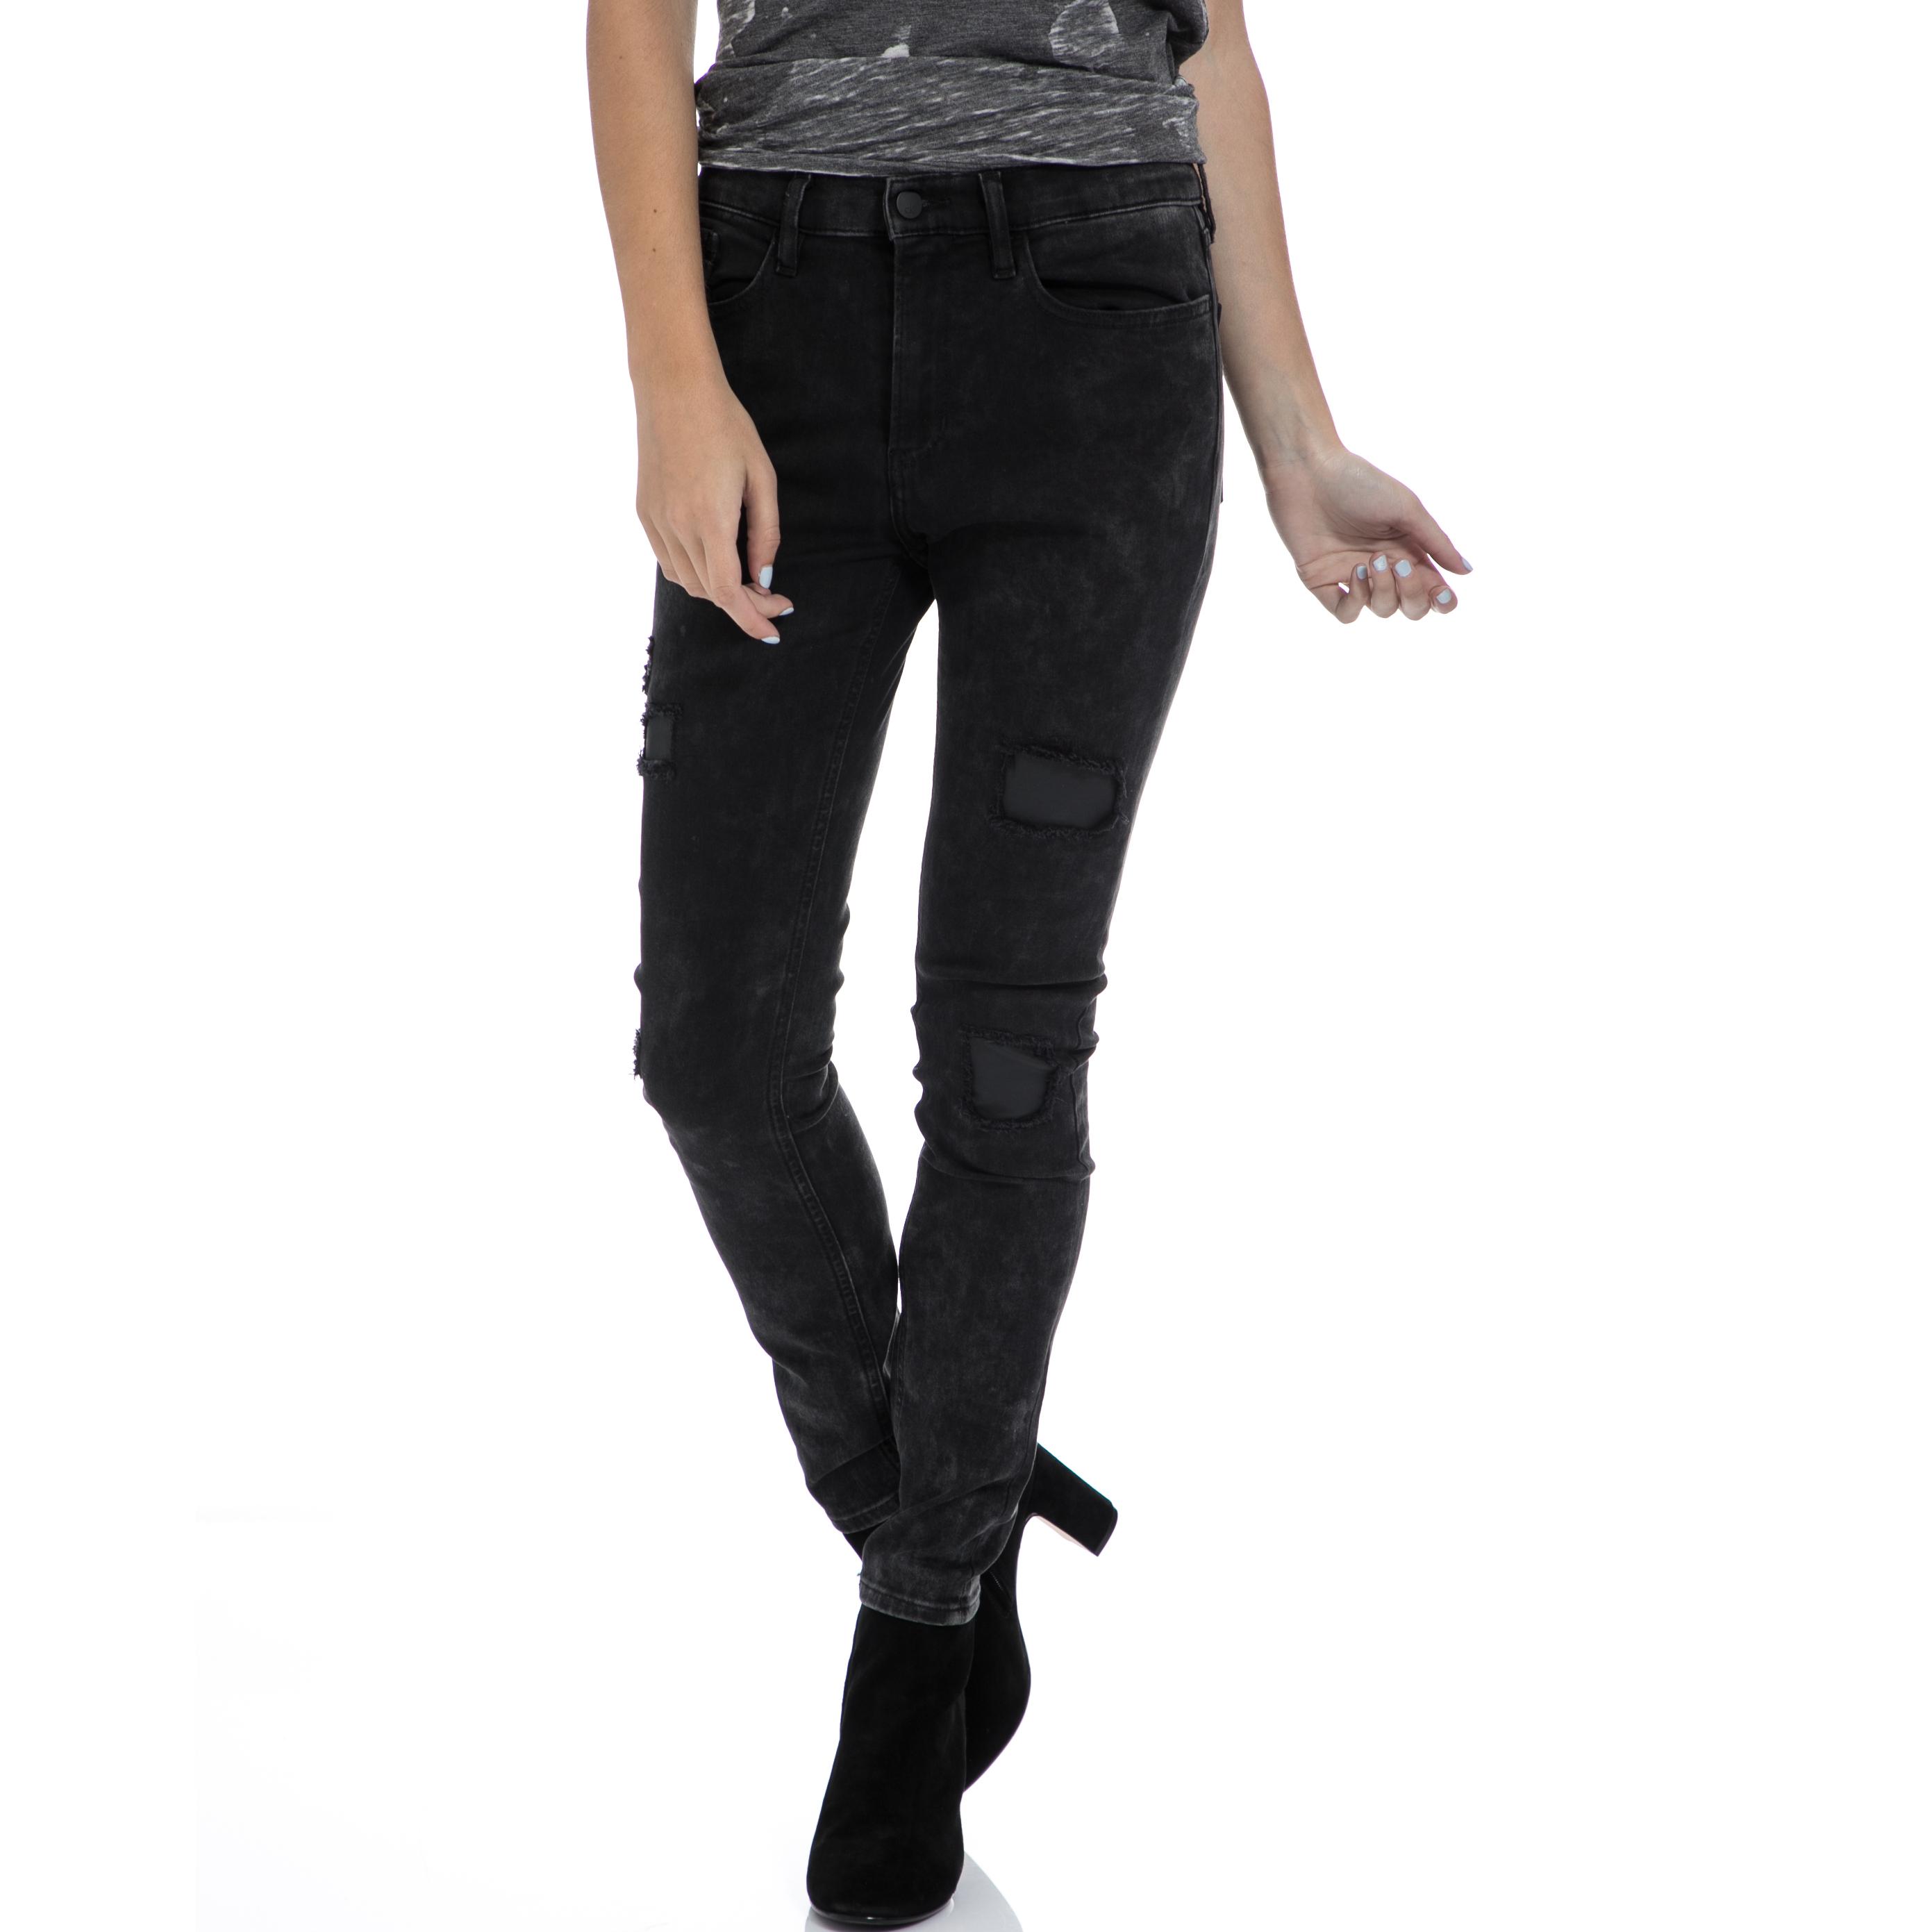 2daf25b57b CALVIN KLEIN JEANS – Γυναικείο τζιν παντελόνι CALVIN KLEIN JEANS μαύρο